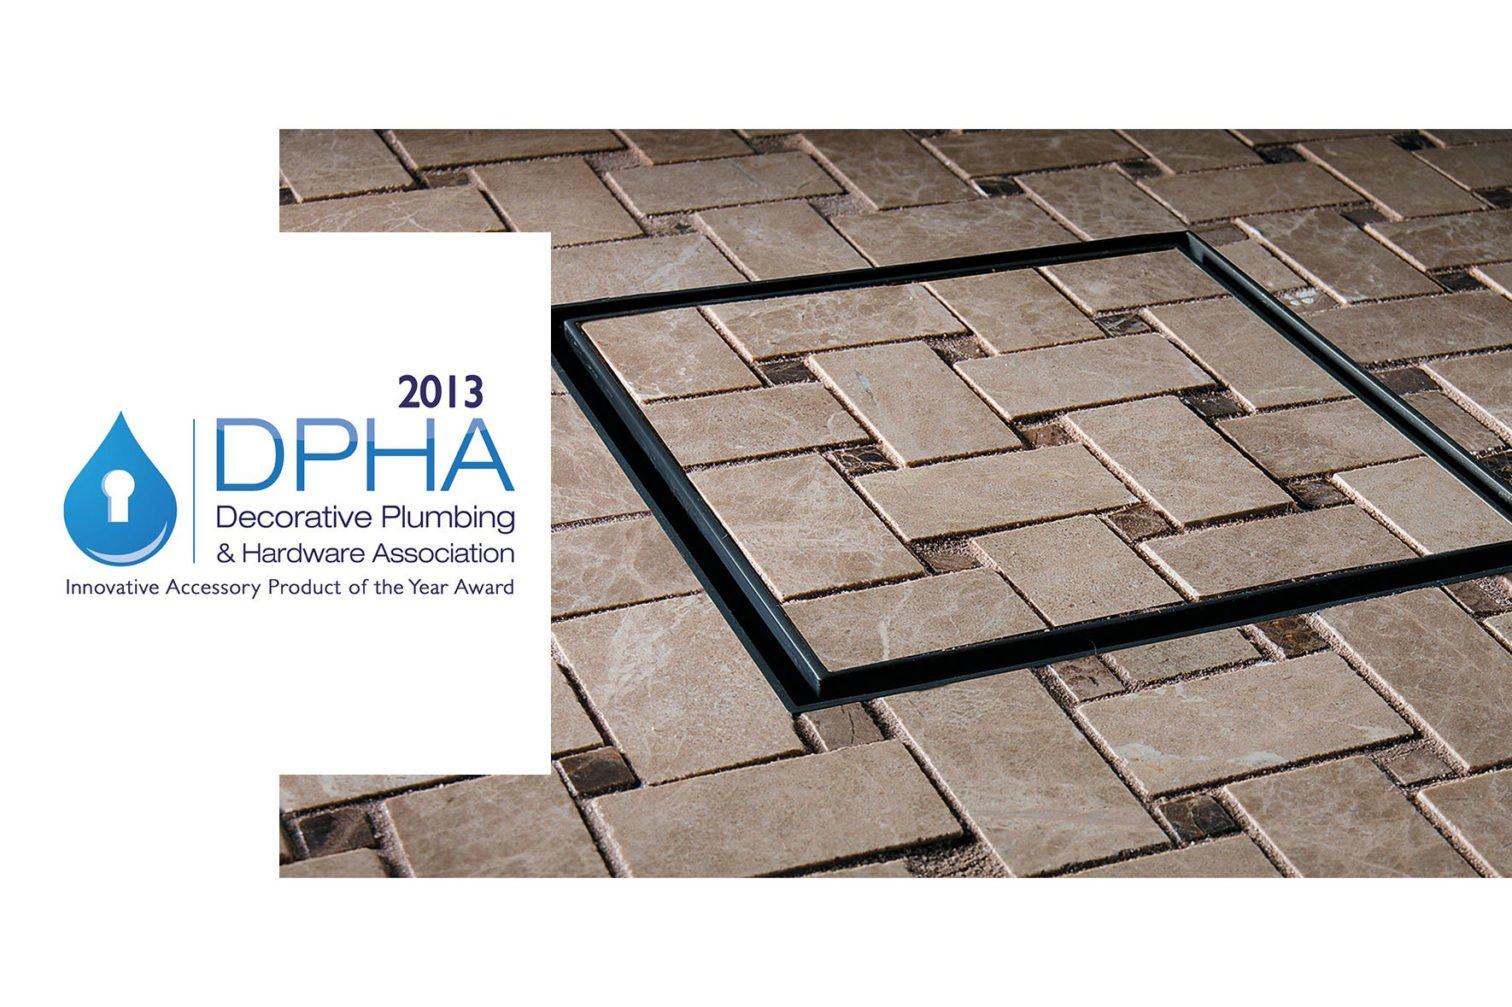 DPHA award 2013 Styledrain tile